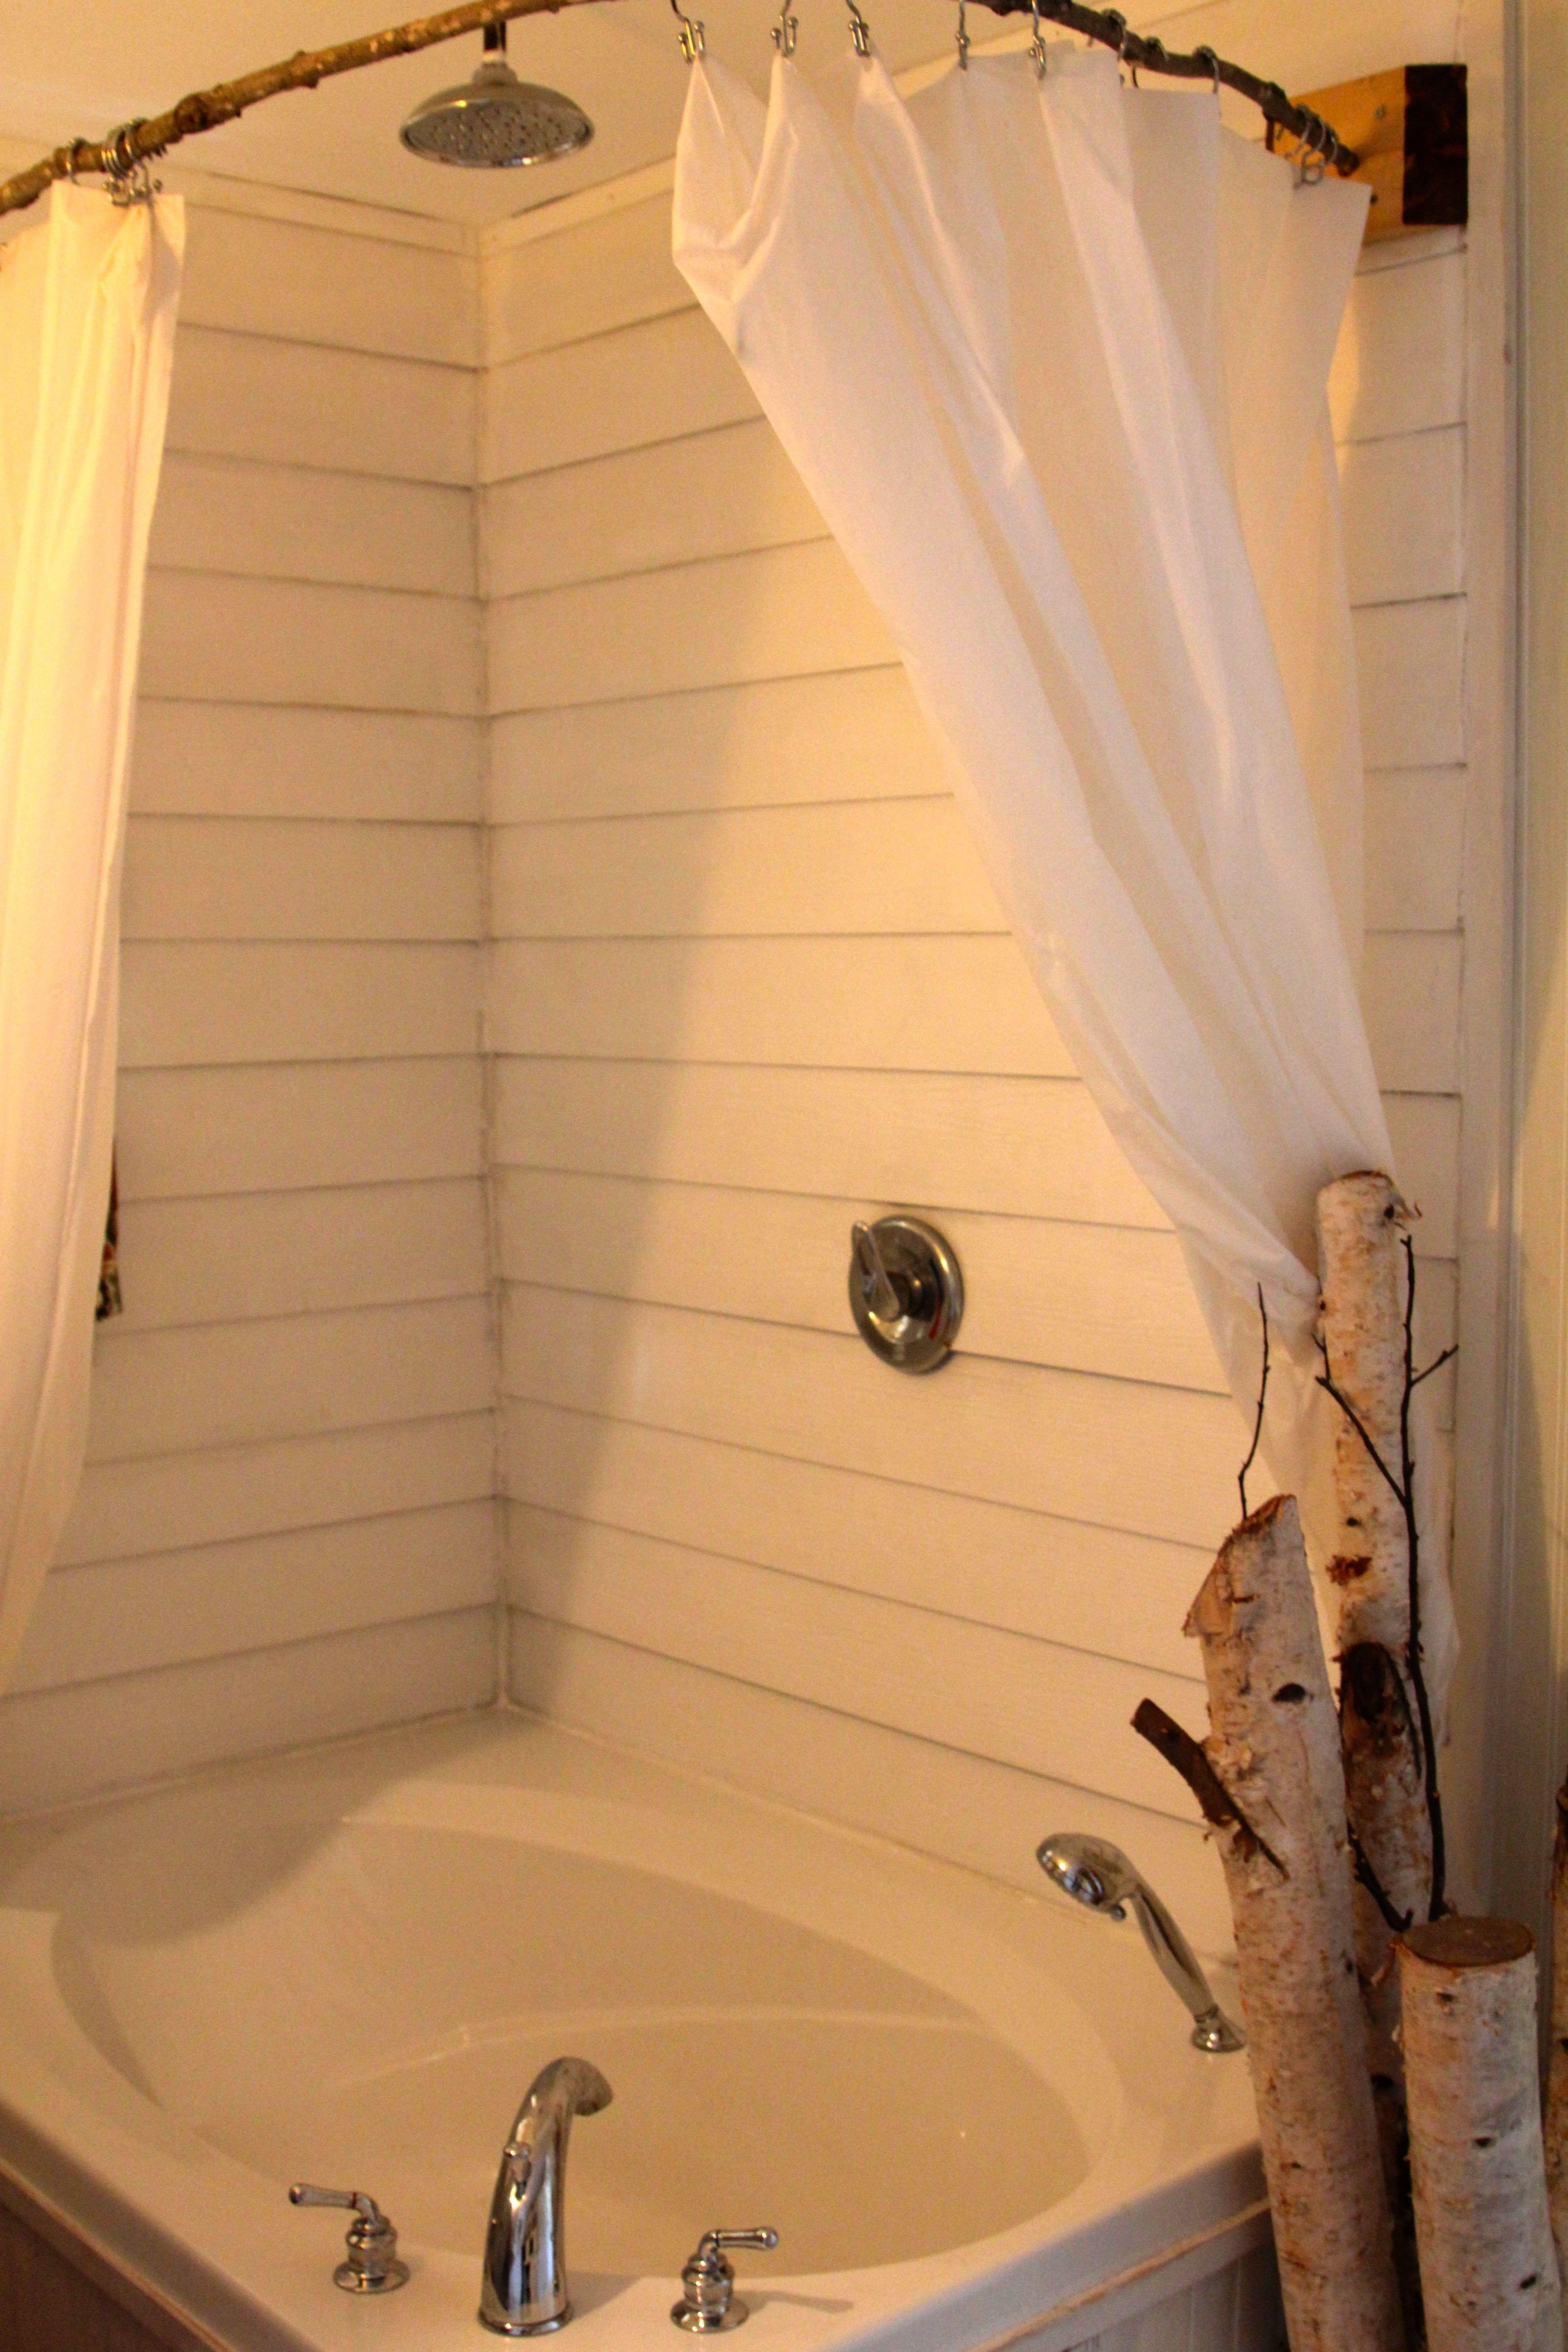 Using Hardi Plank Siding As Bath Surround Harvesting Sapling For regarding size 3456 X 5184